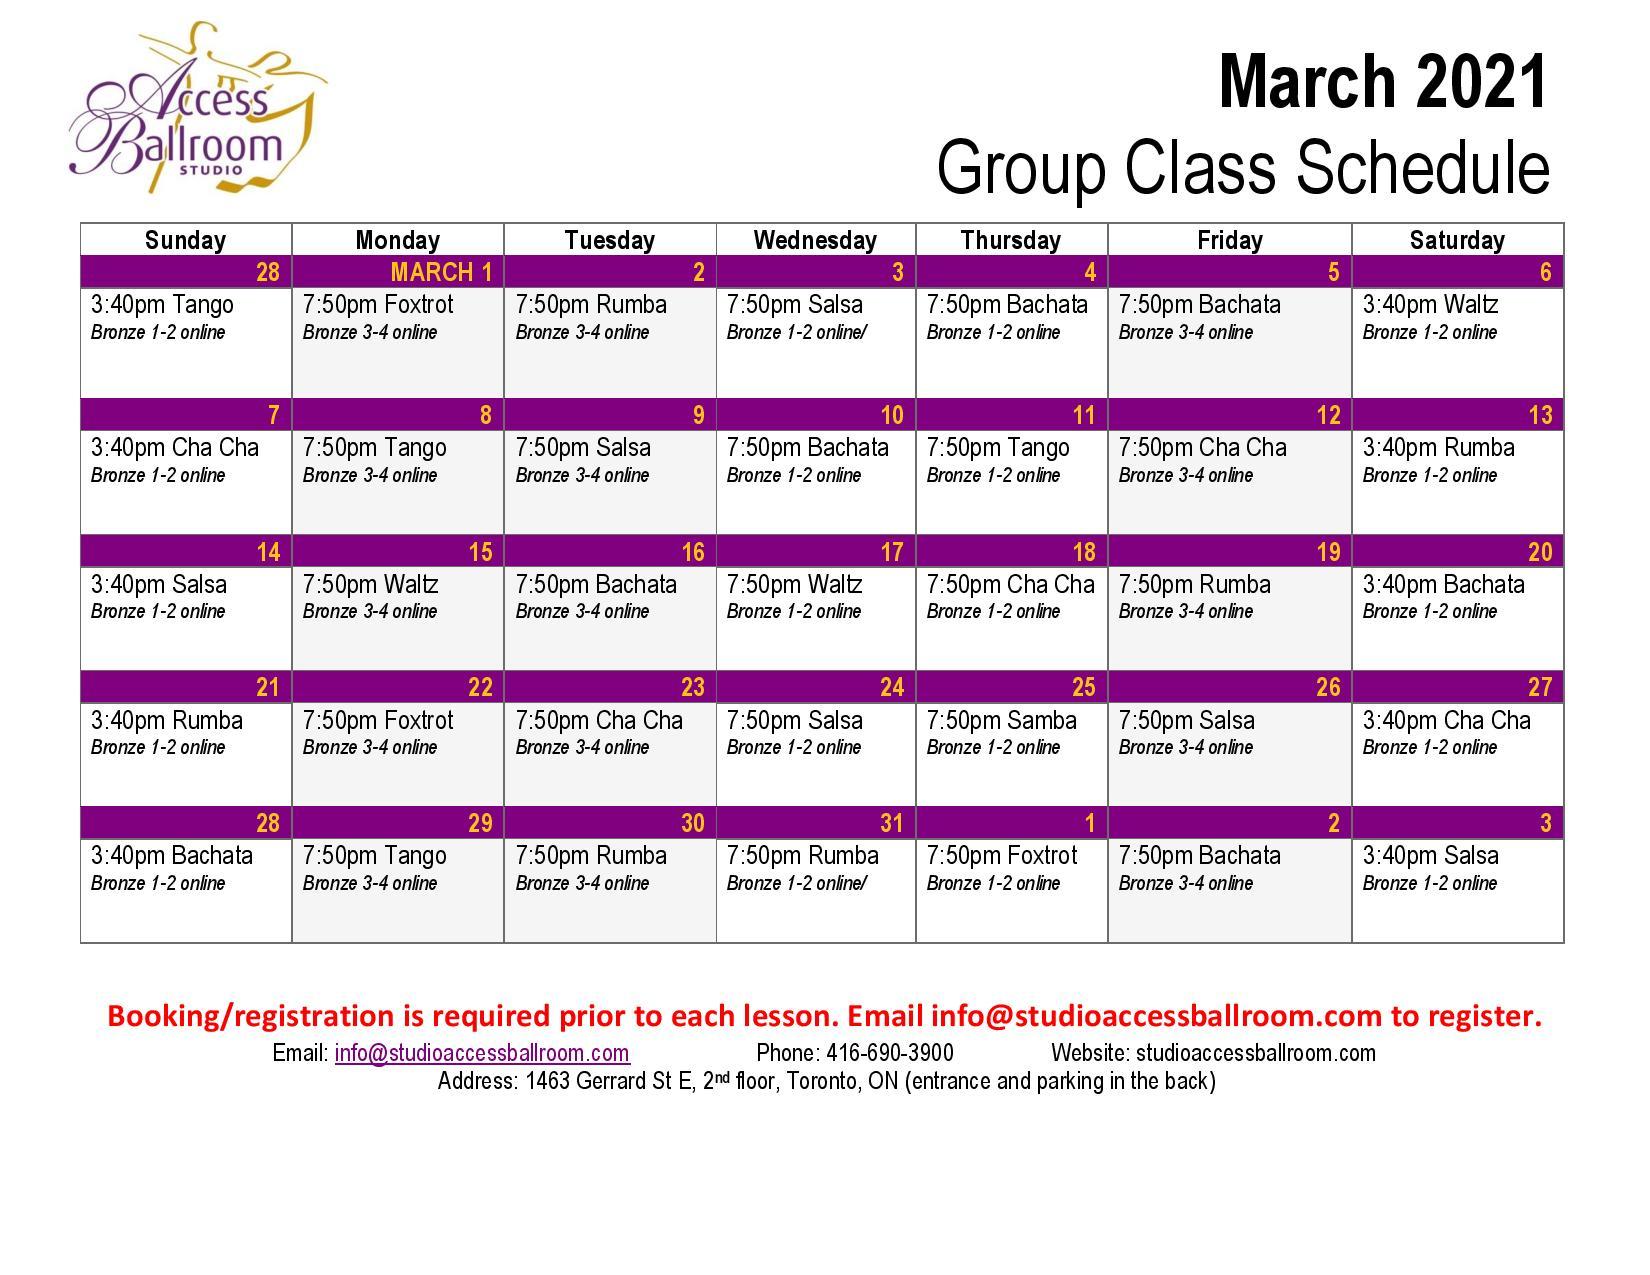 Access Ballroom March 2021 schedule